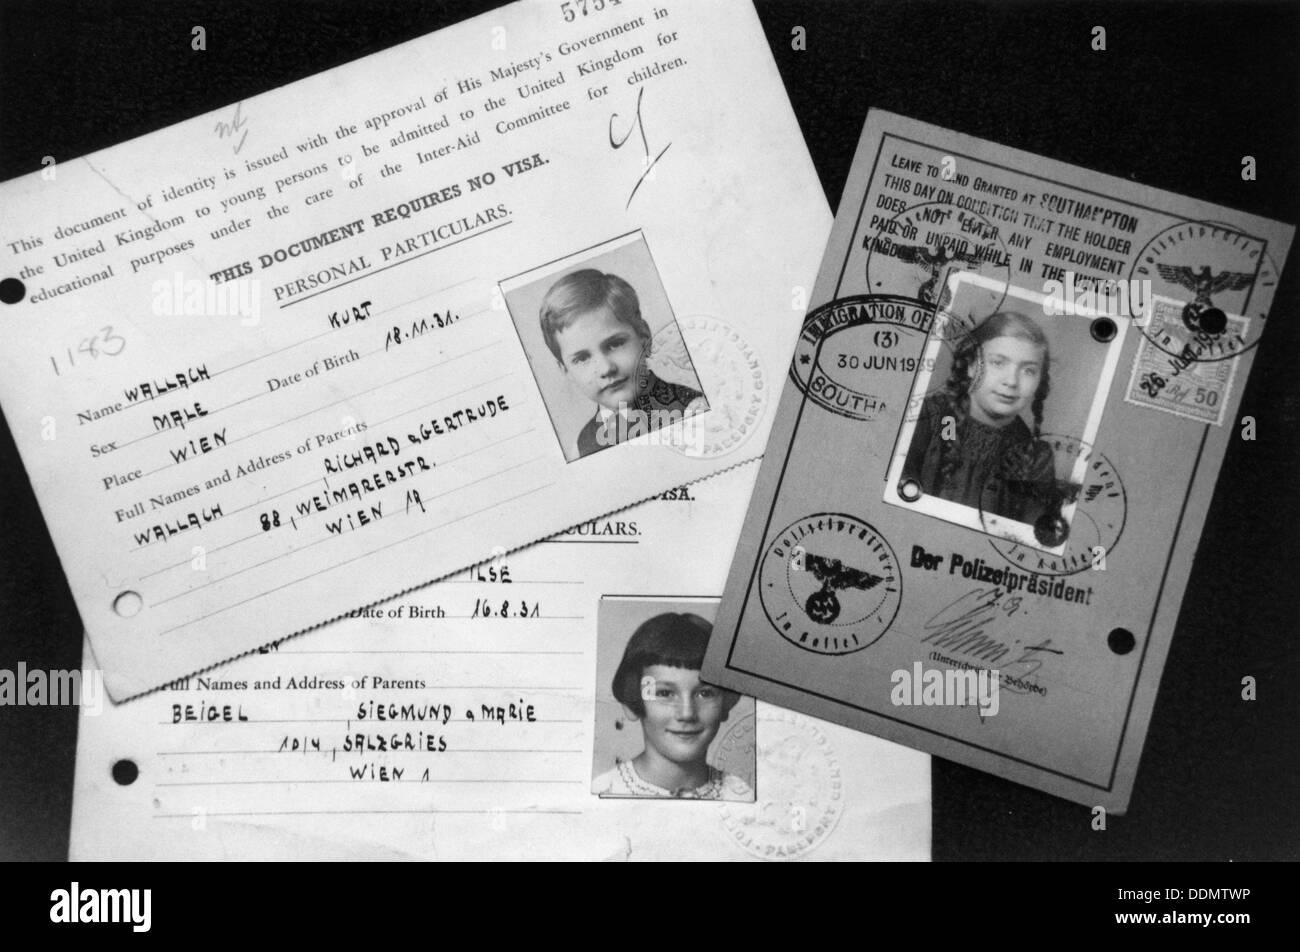 Kindertransport documents, c1939. - Stock Image